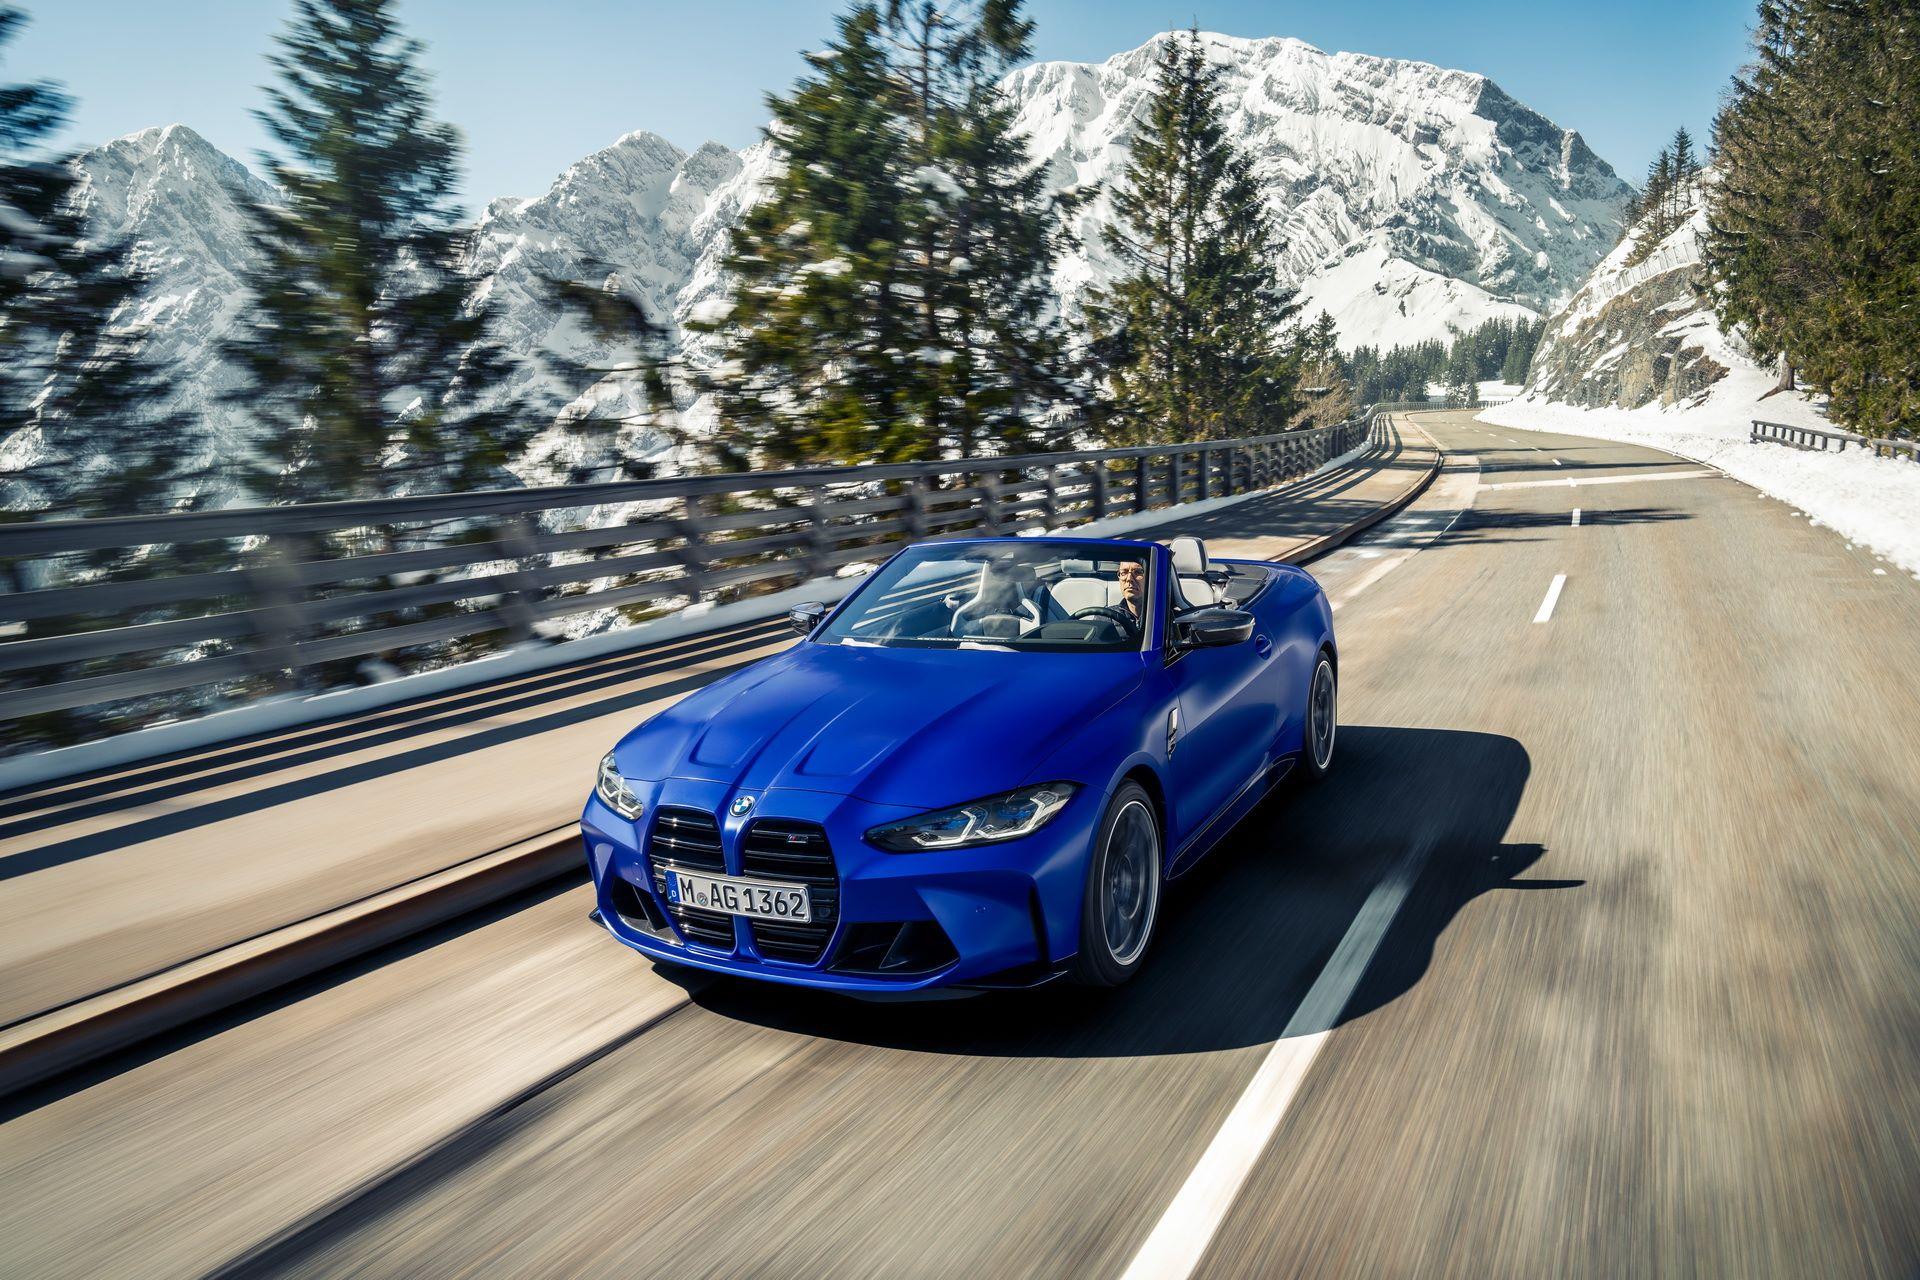 BMW-M4-Convertible-5